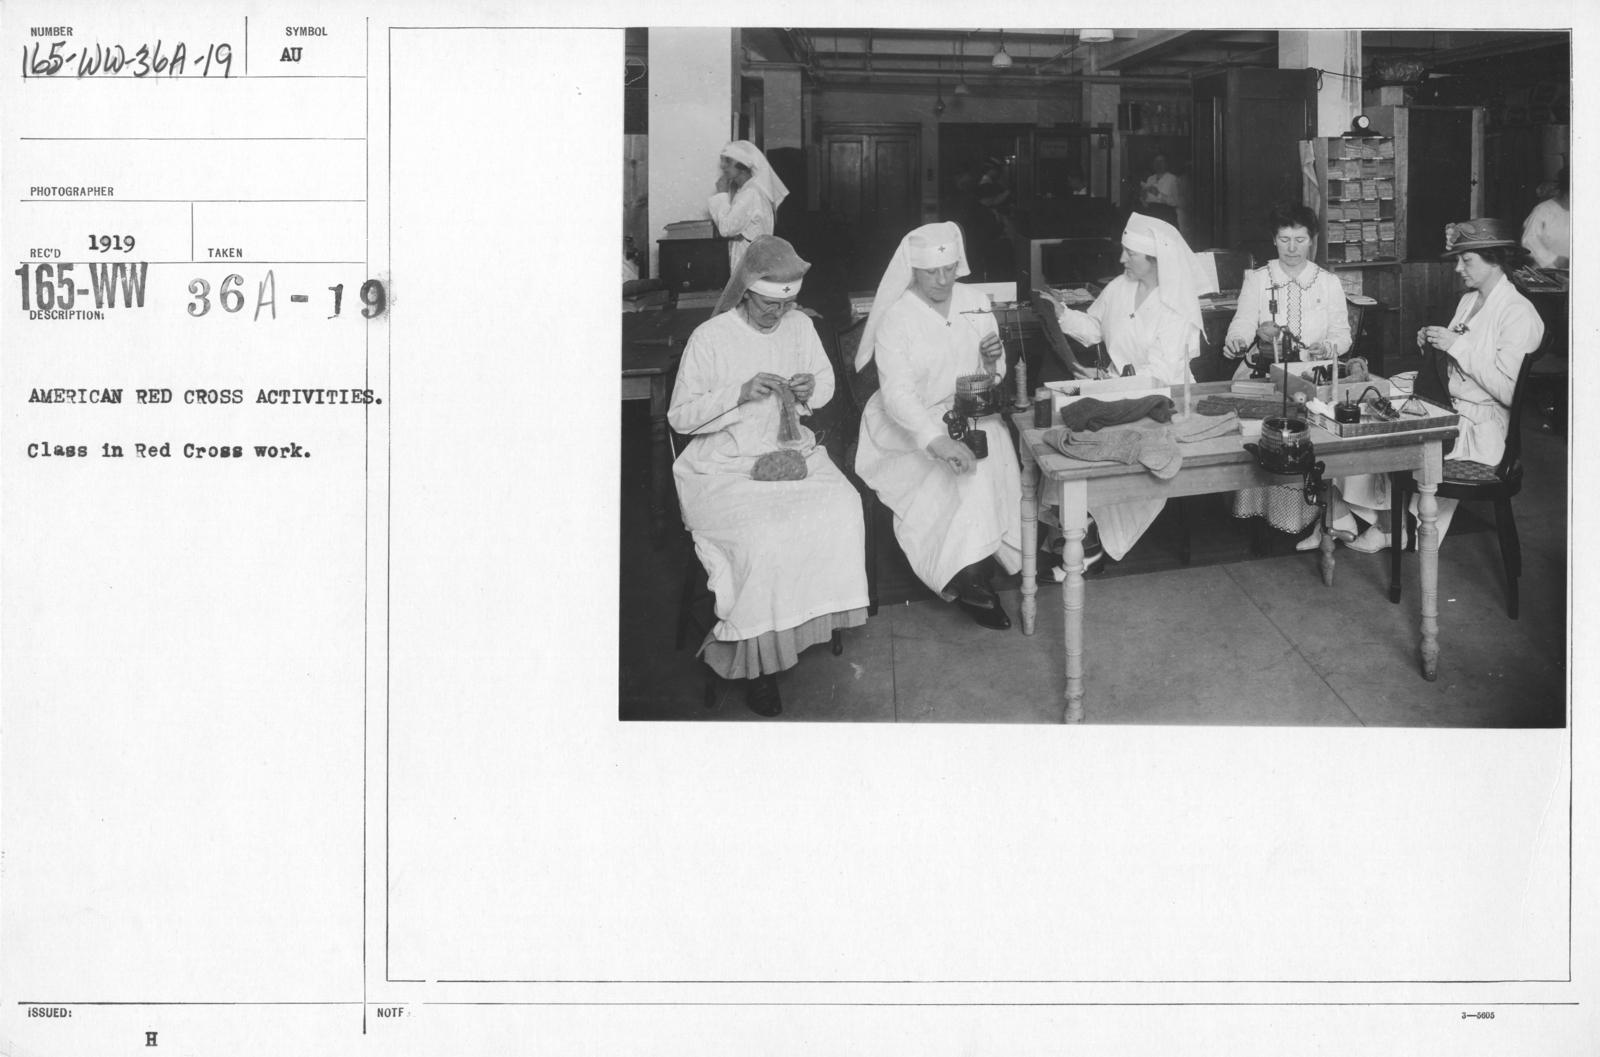 American Red Cross - Classes in Red Cross Work (workrooms and classes) - American Red Cross Activities. Class in Red Cross Work